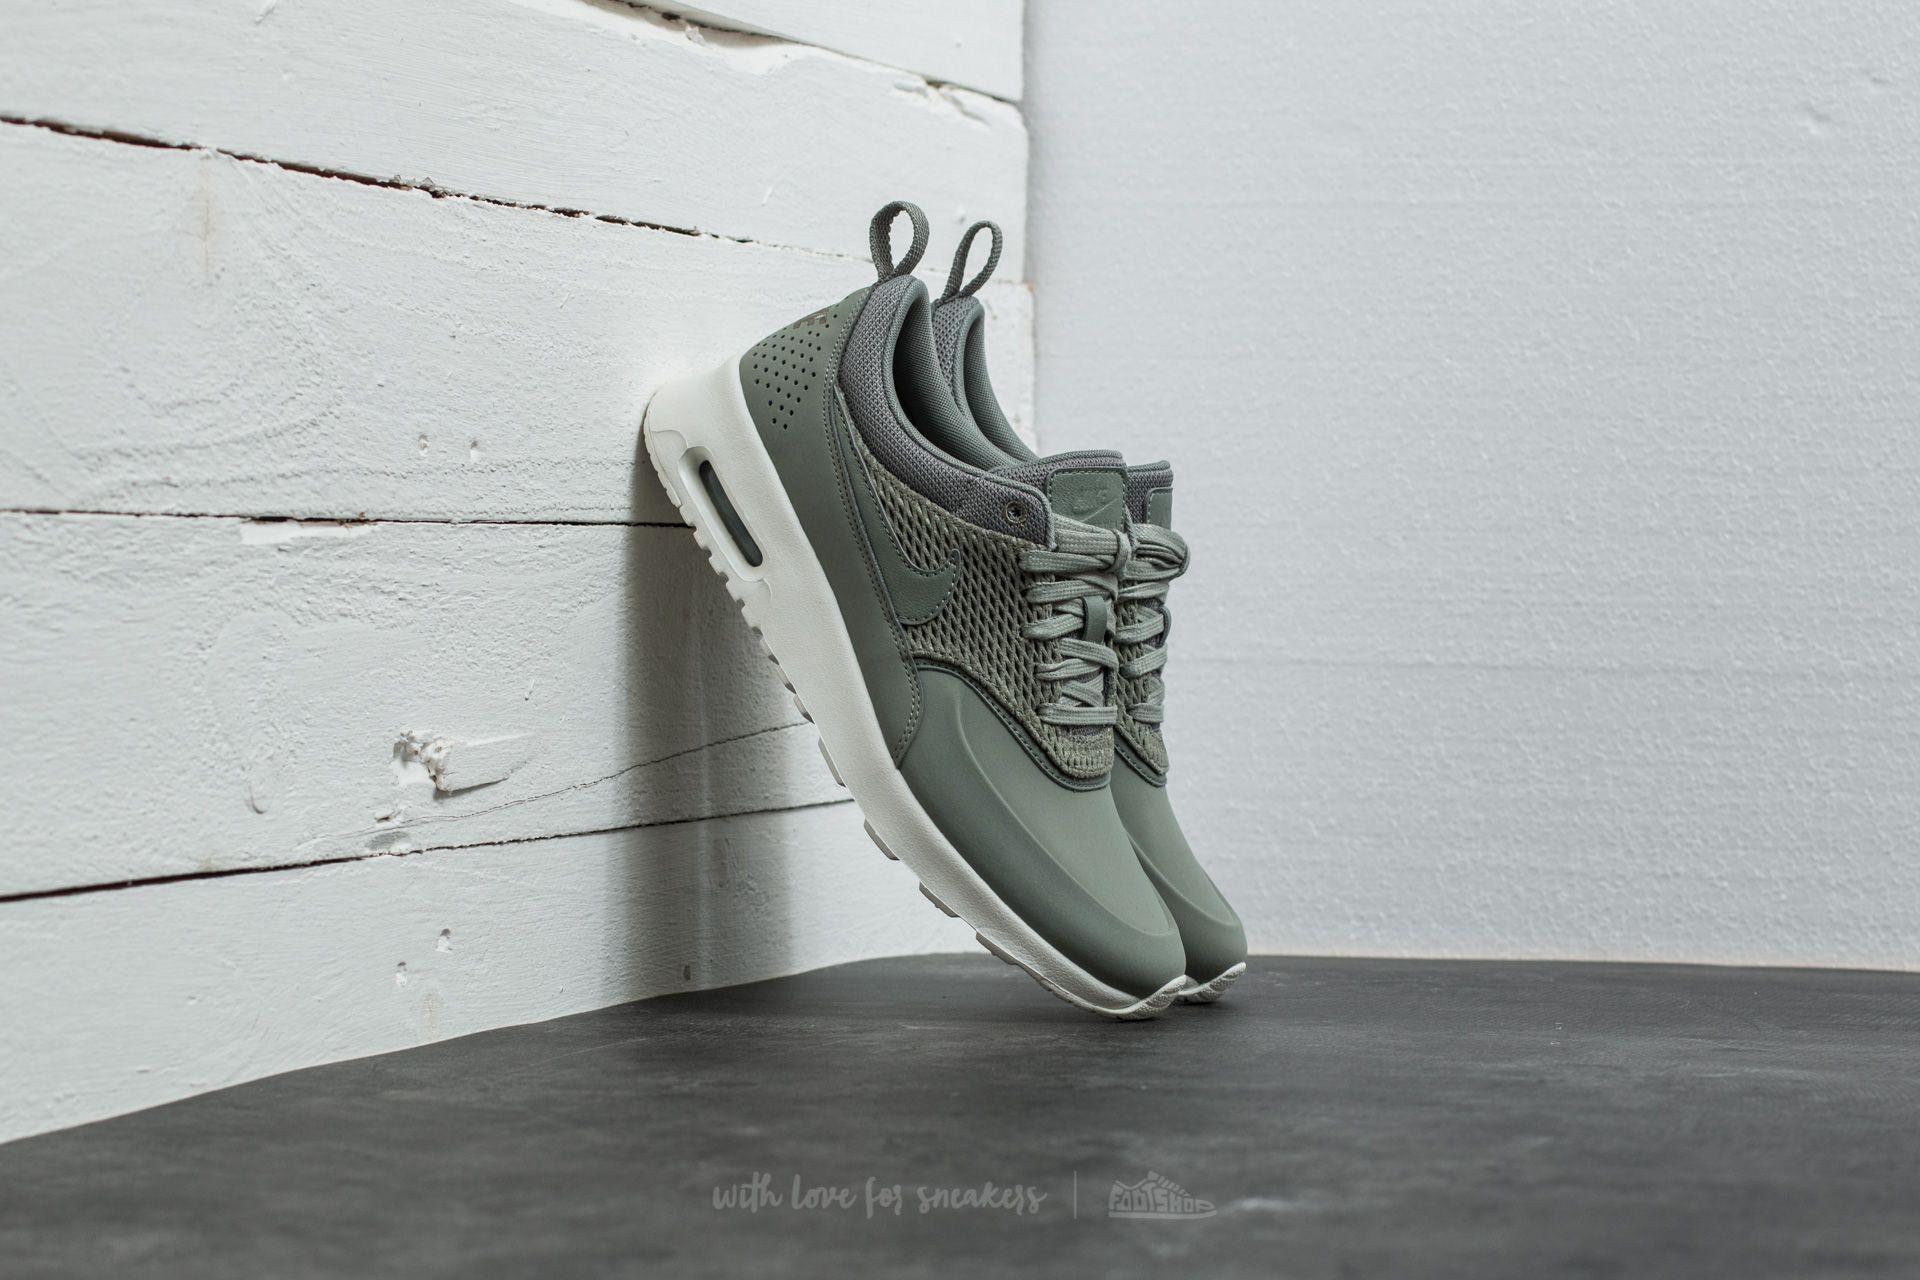 9c1de4744d Nike Wmns Air Max Thea Premium Leather Dark Stucco/ Dark Stucco ...